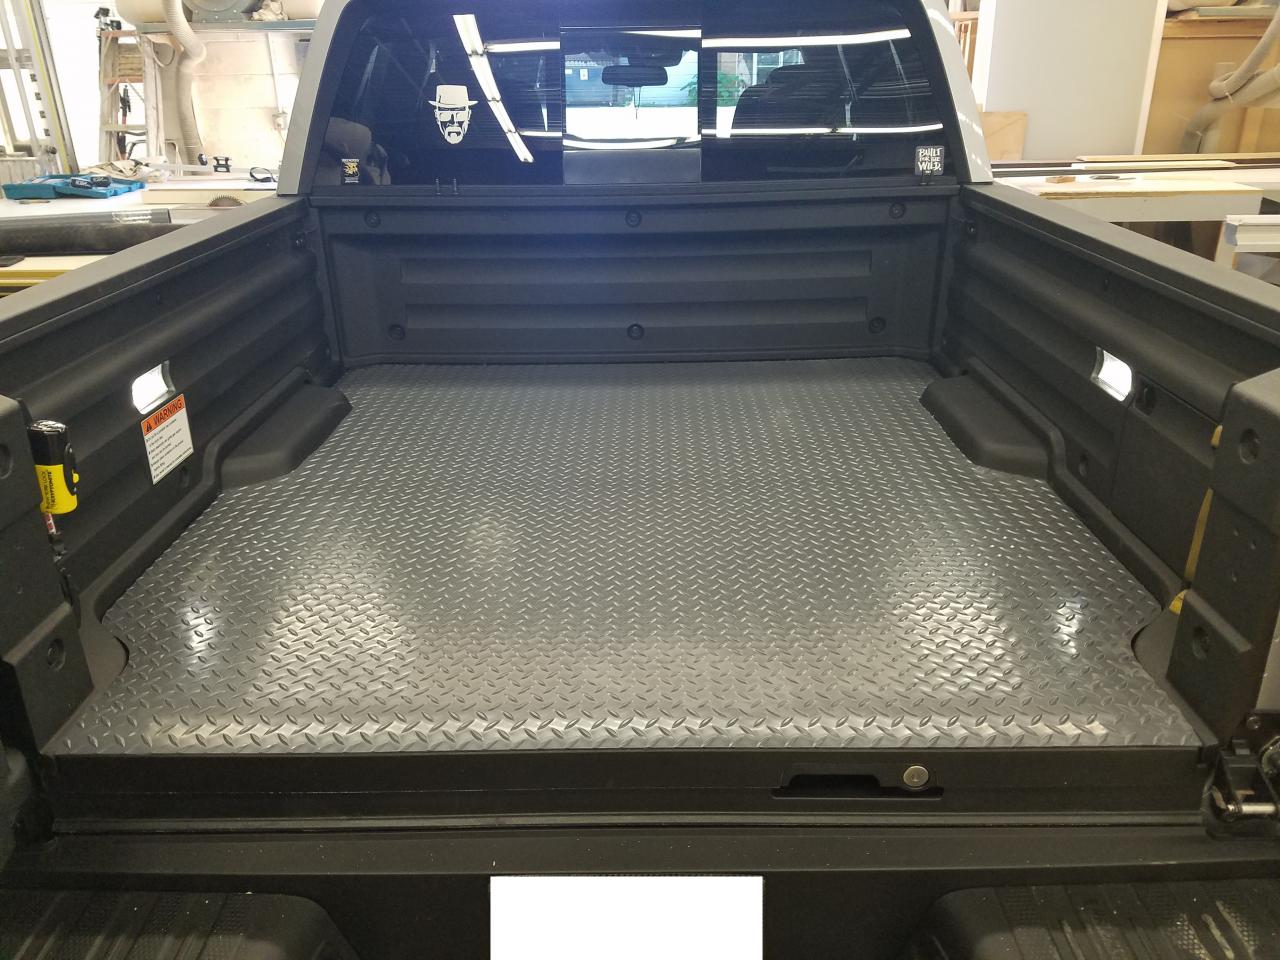 2017 Ridgeline Bed Mat !!! - Honda Ridgeline Owners Club ...